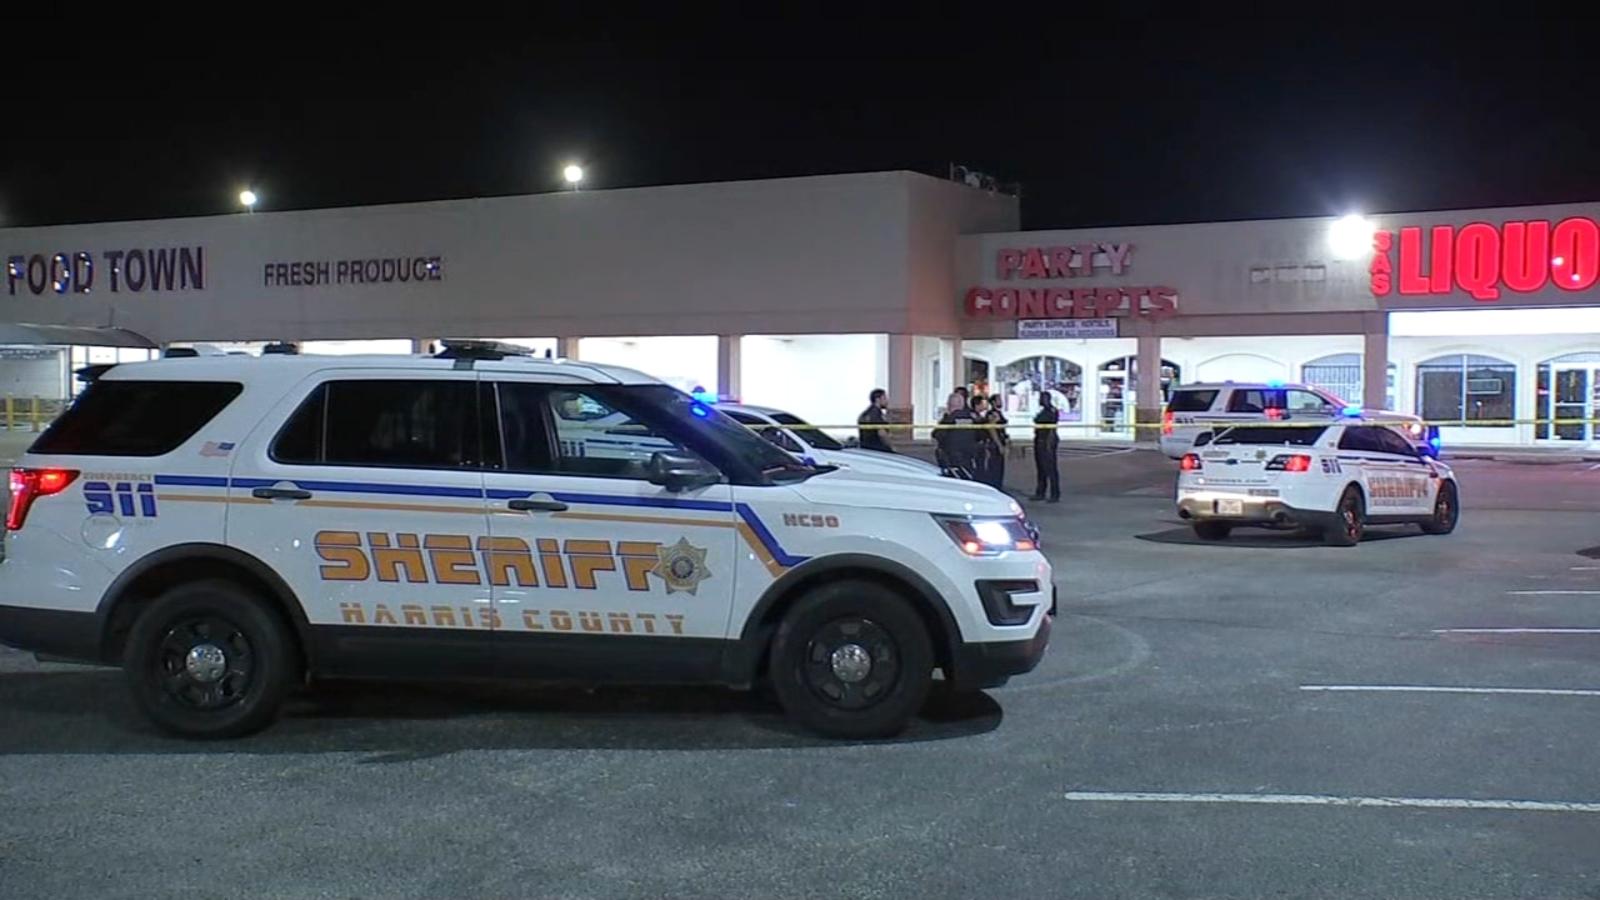 Woman walking dog shoots and kills homeless woman outside N Harris Co. store, deputies say